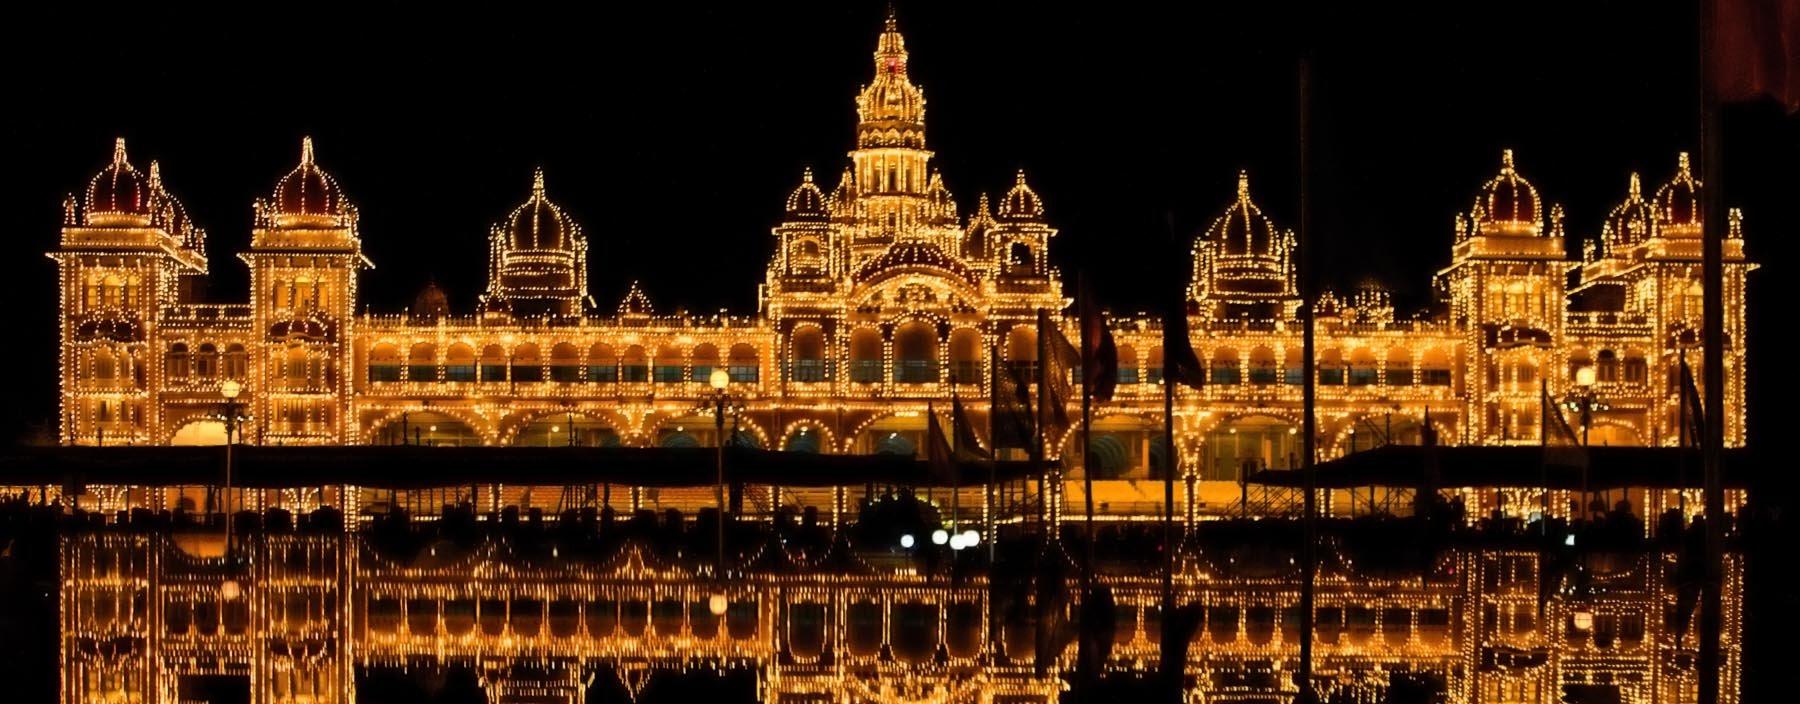 in, mysore, koninklijk paleis (3).jpg